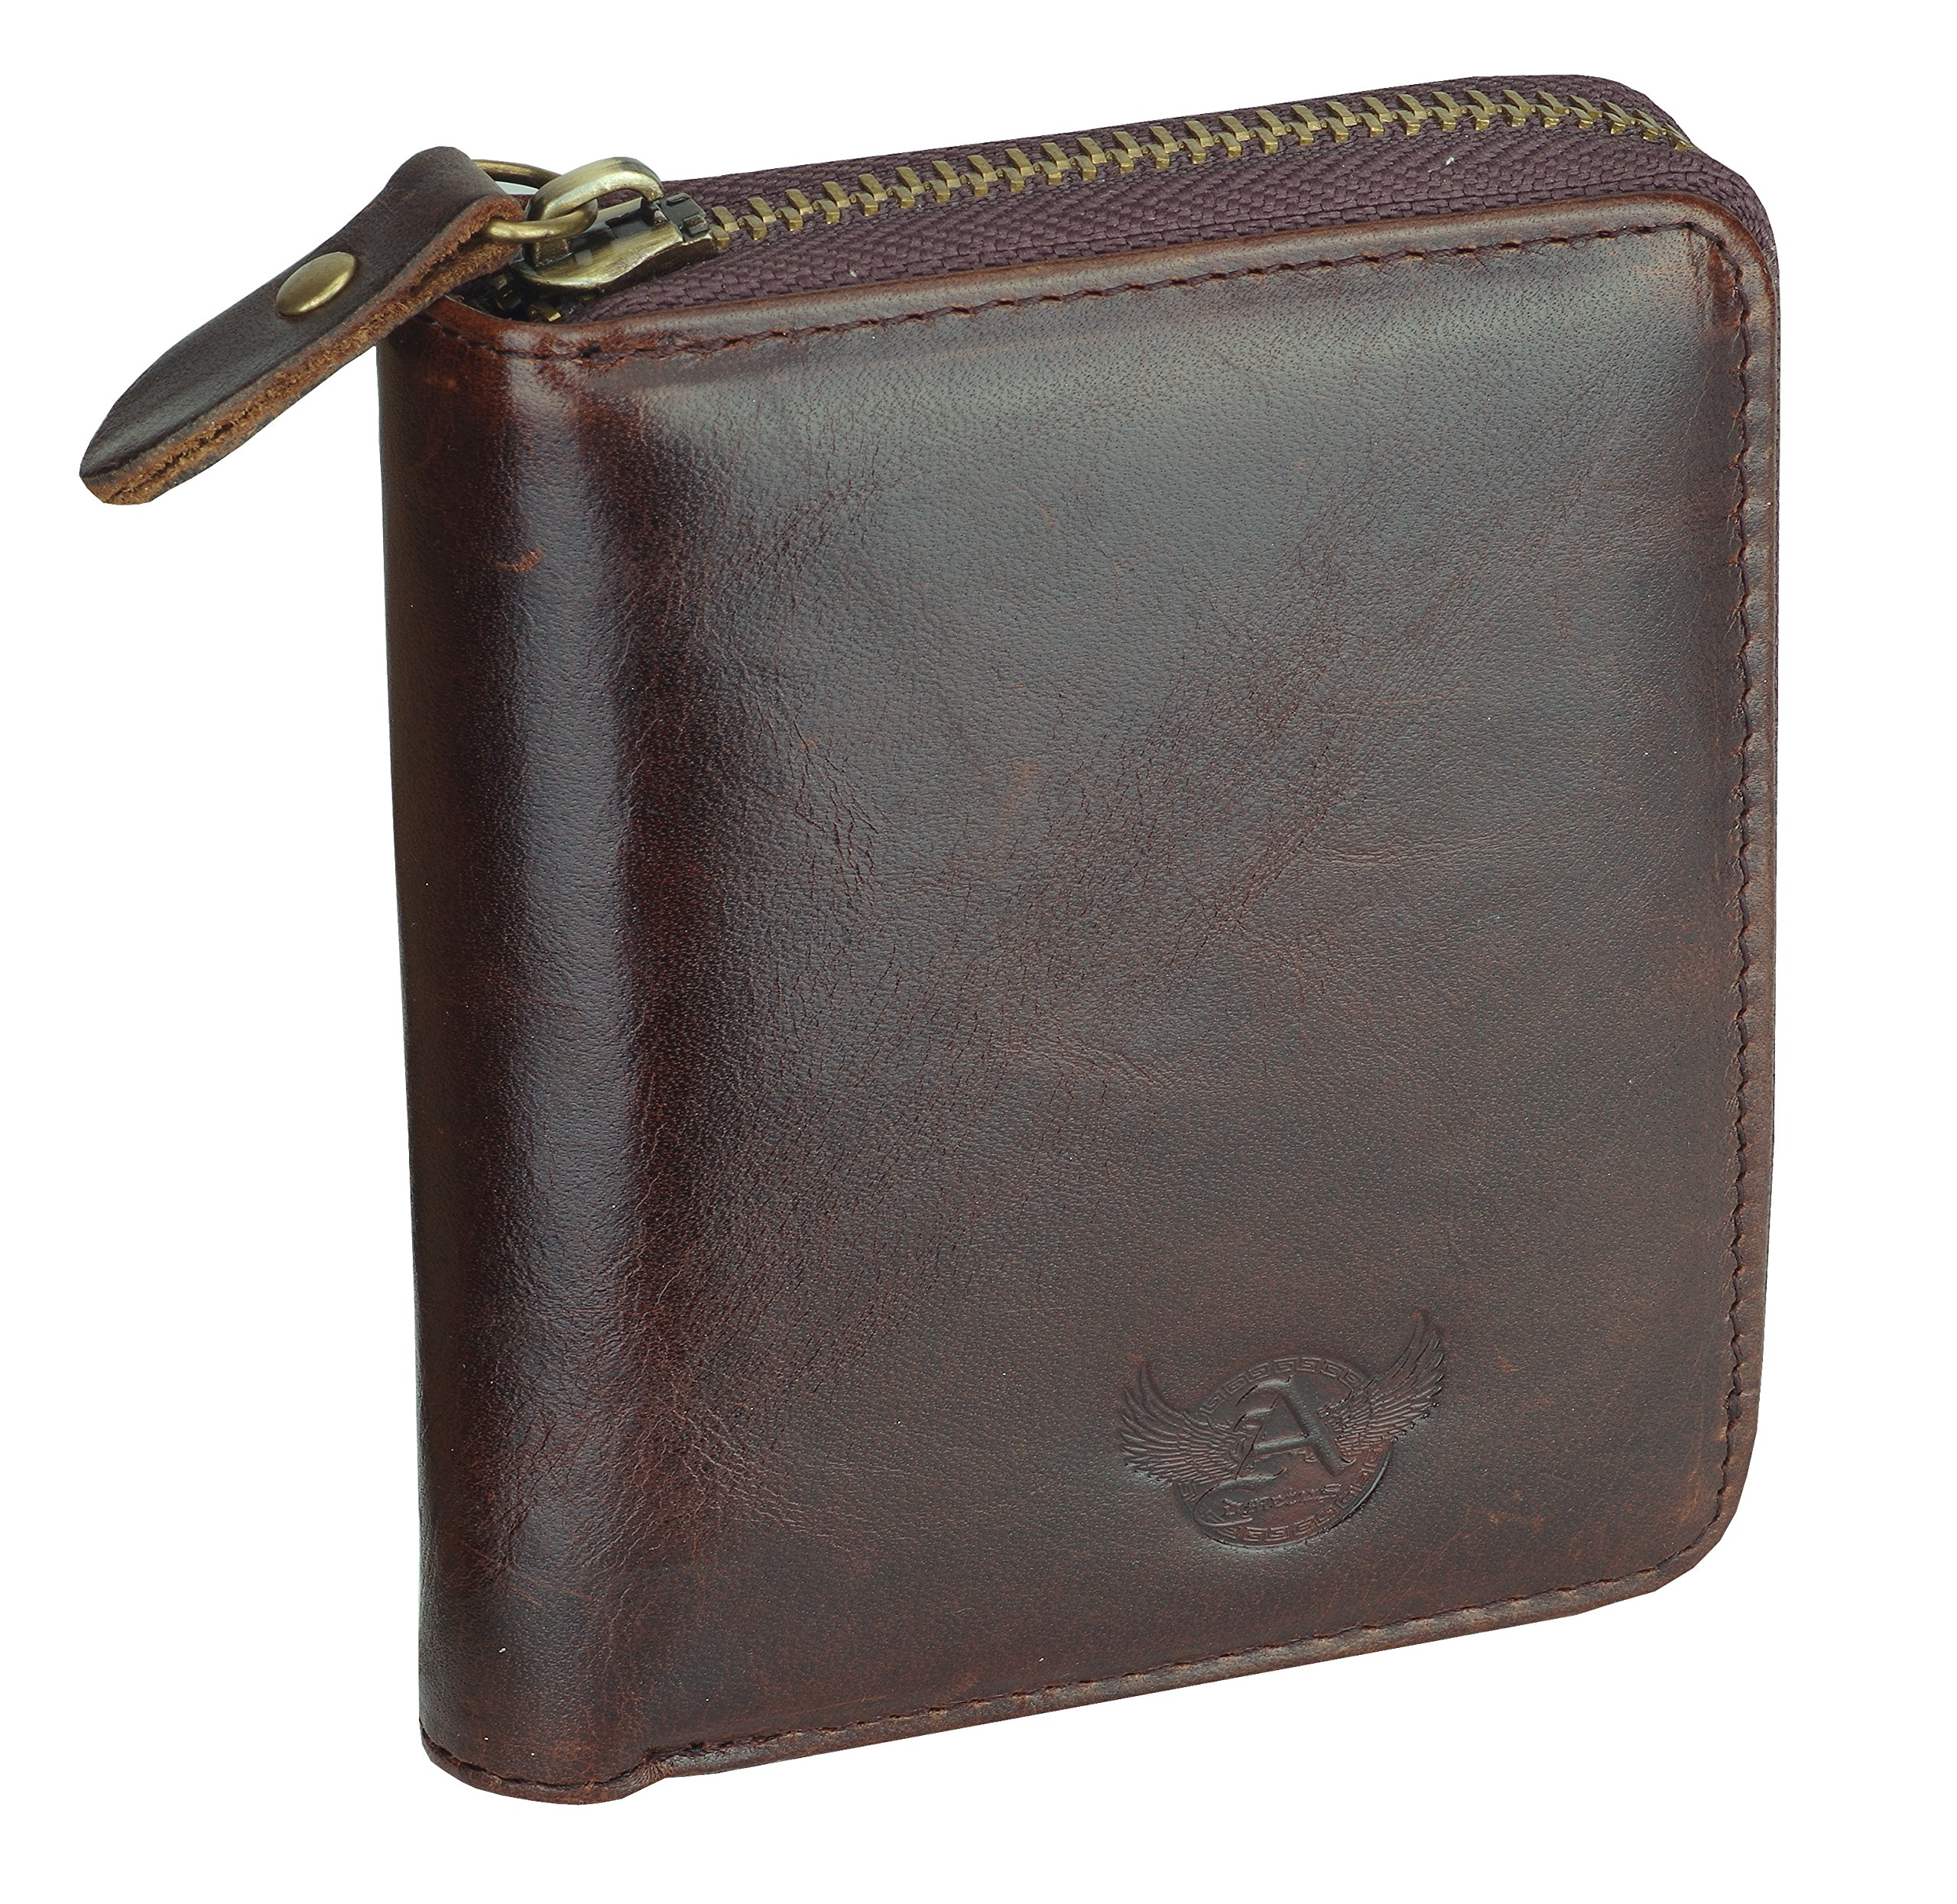 Admetus Men's Genuine Leather Short Zip-around Bifold Wallet Exquisite box Christmas Gift Brown10